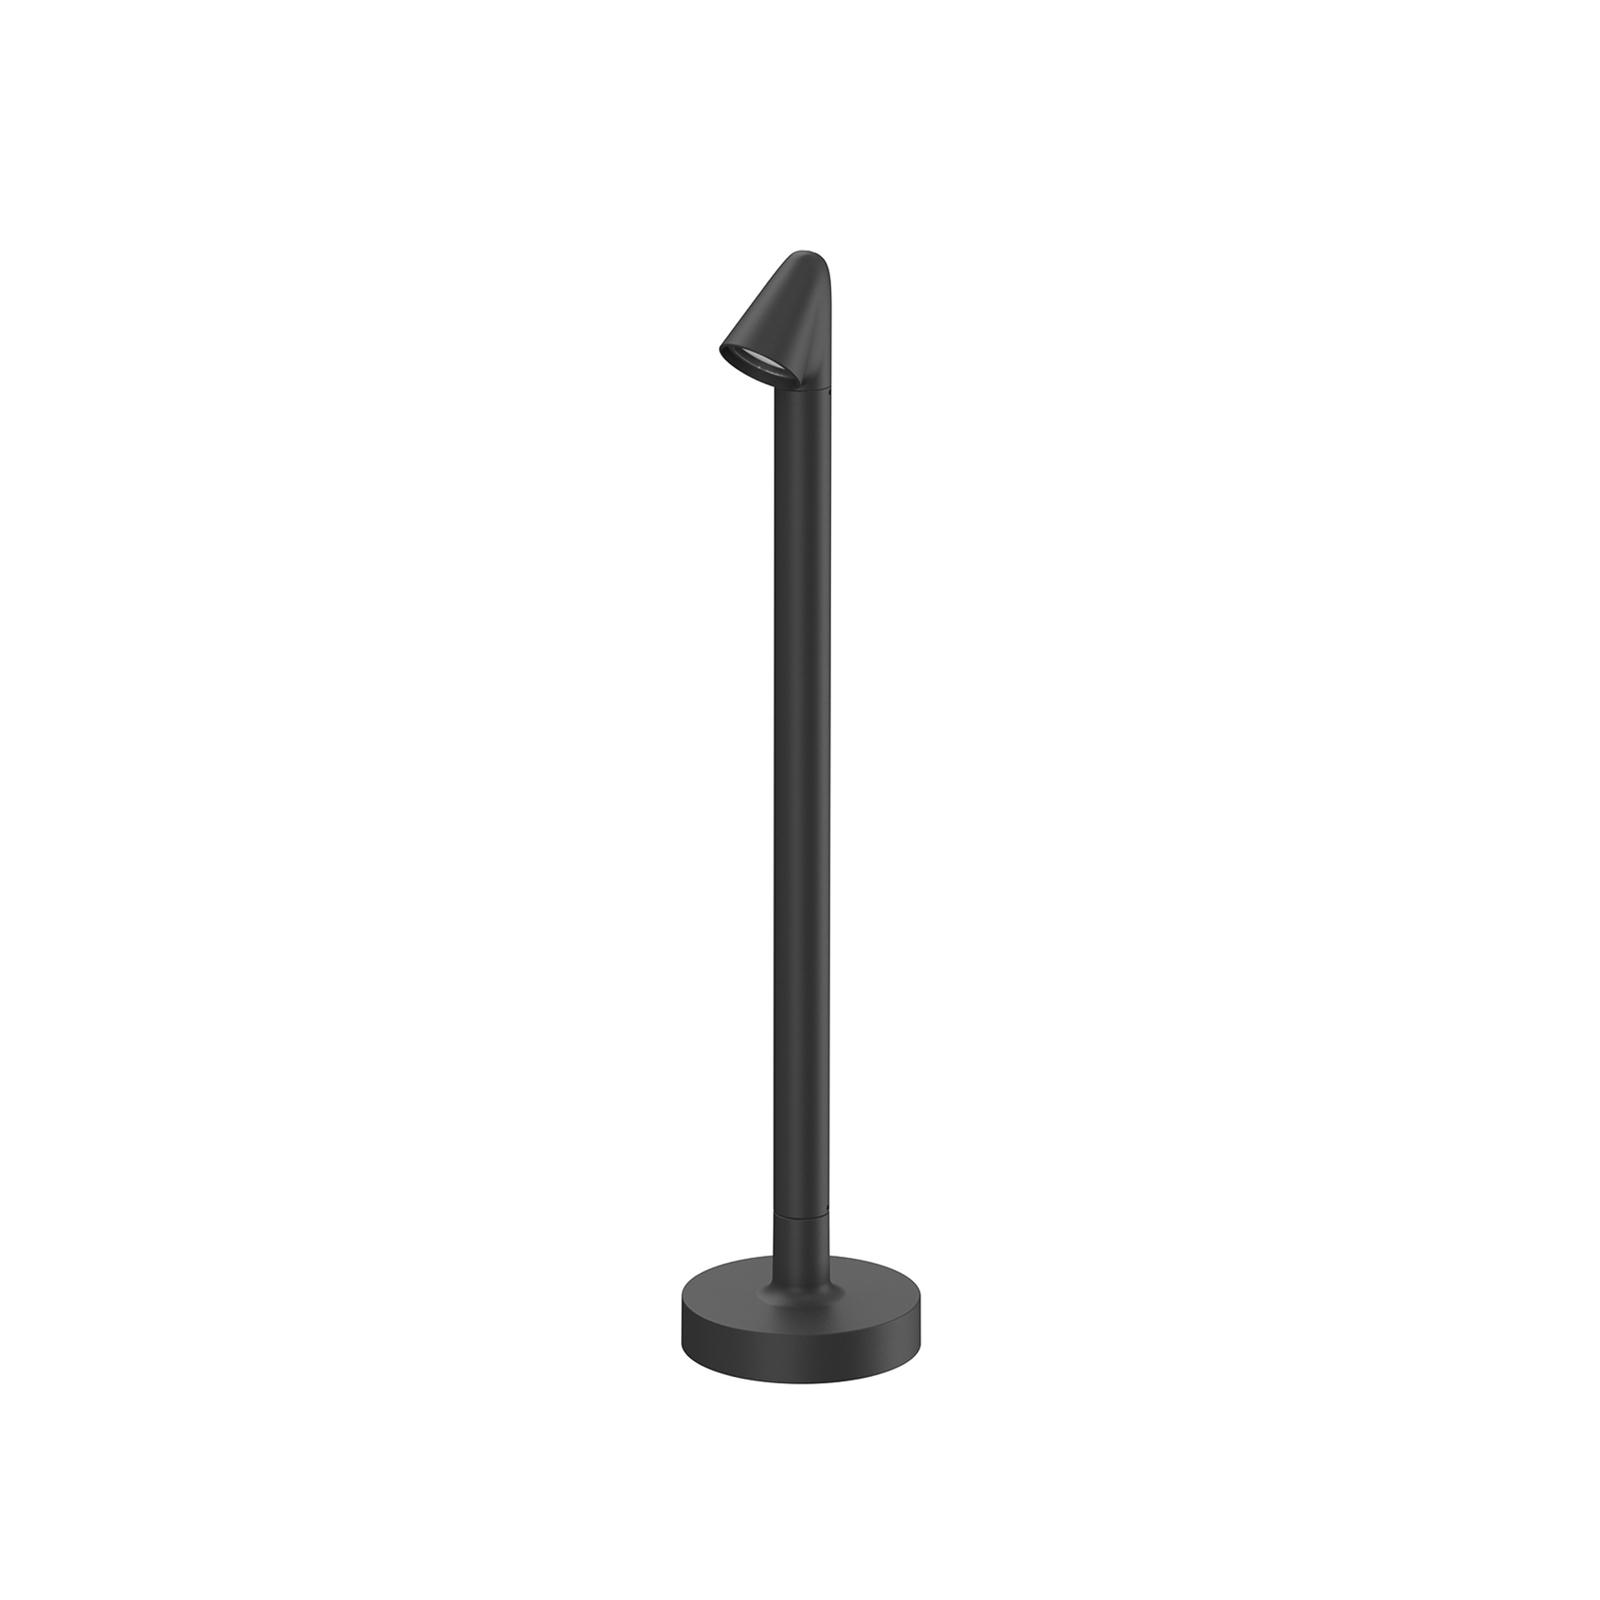 FLOS Walkstick 1 gånglampa 2700K, svart